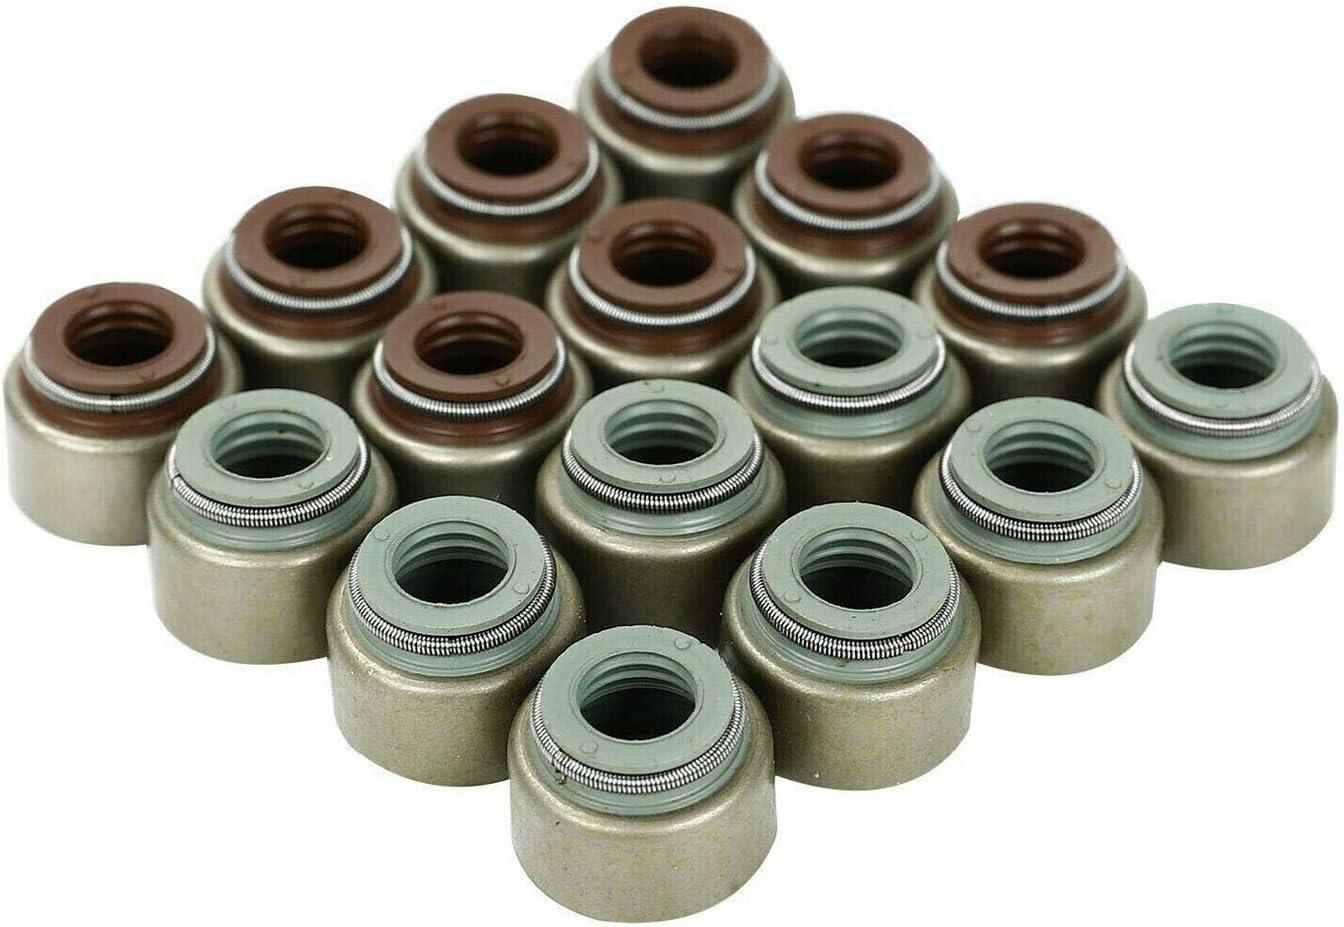 Non-VTEC TYFYB Valve Stem Seals Standard 6.6mm Viton Valve Stem Seals Kit Compatible with 1990-1993 Acura Integra RS//LS//GS 1.8L B20B4//B20Z2 B18A1 1997-2001 Honda CRV 2.0L